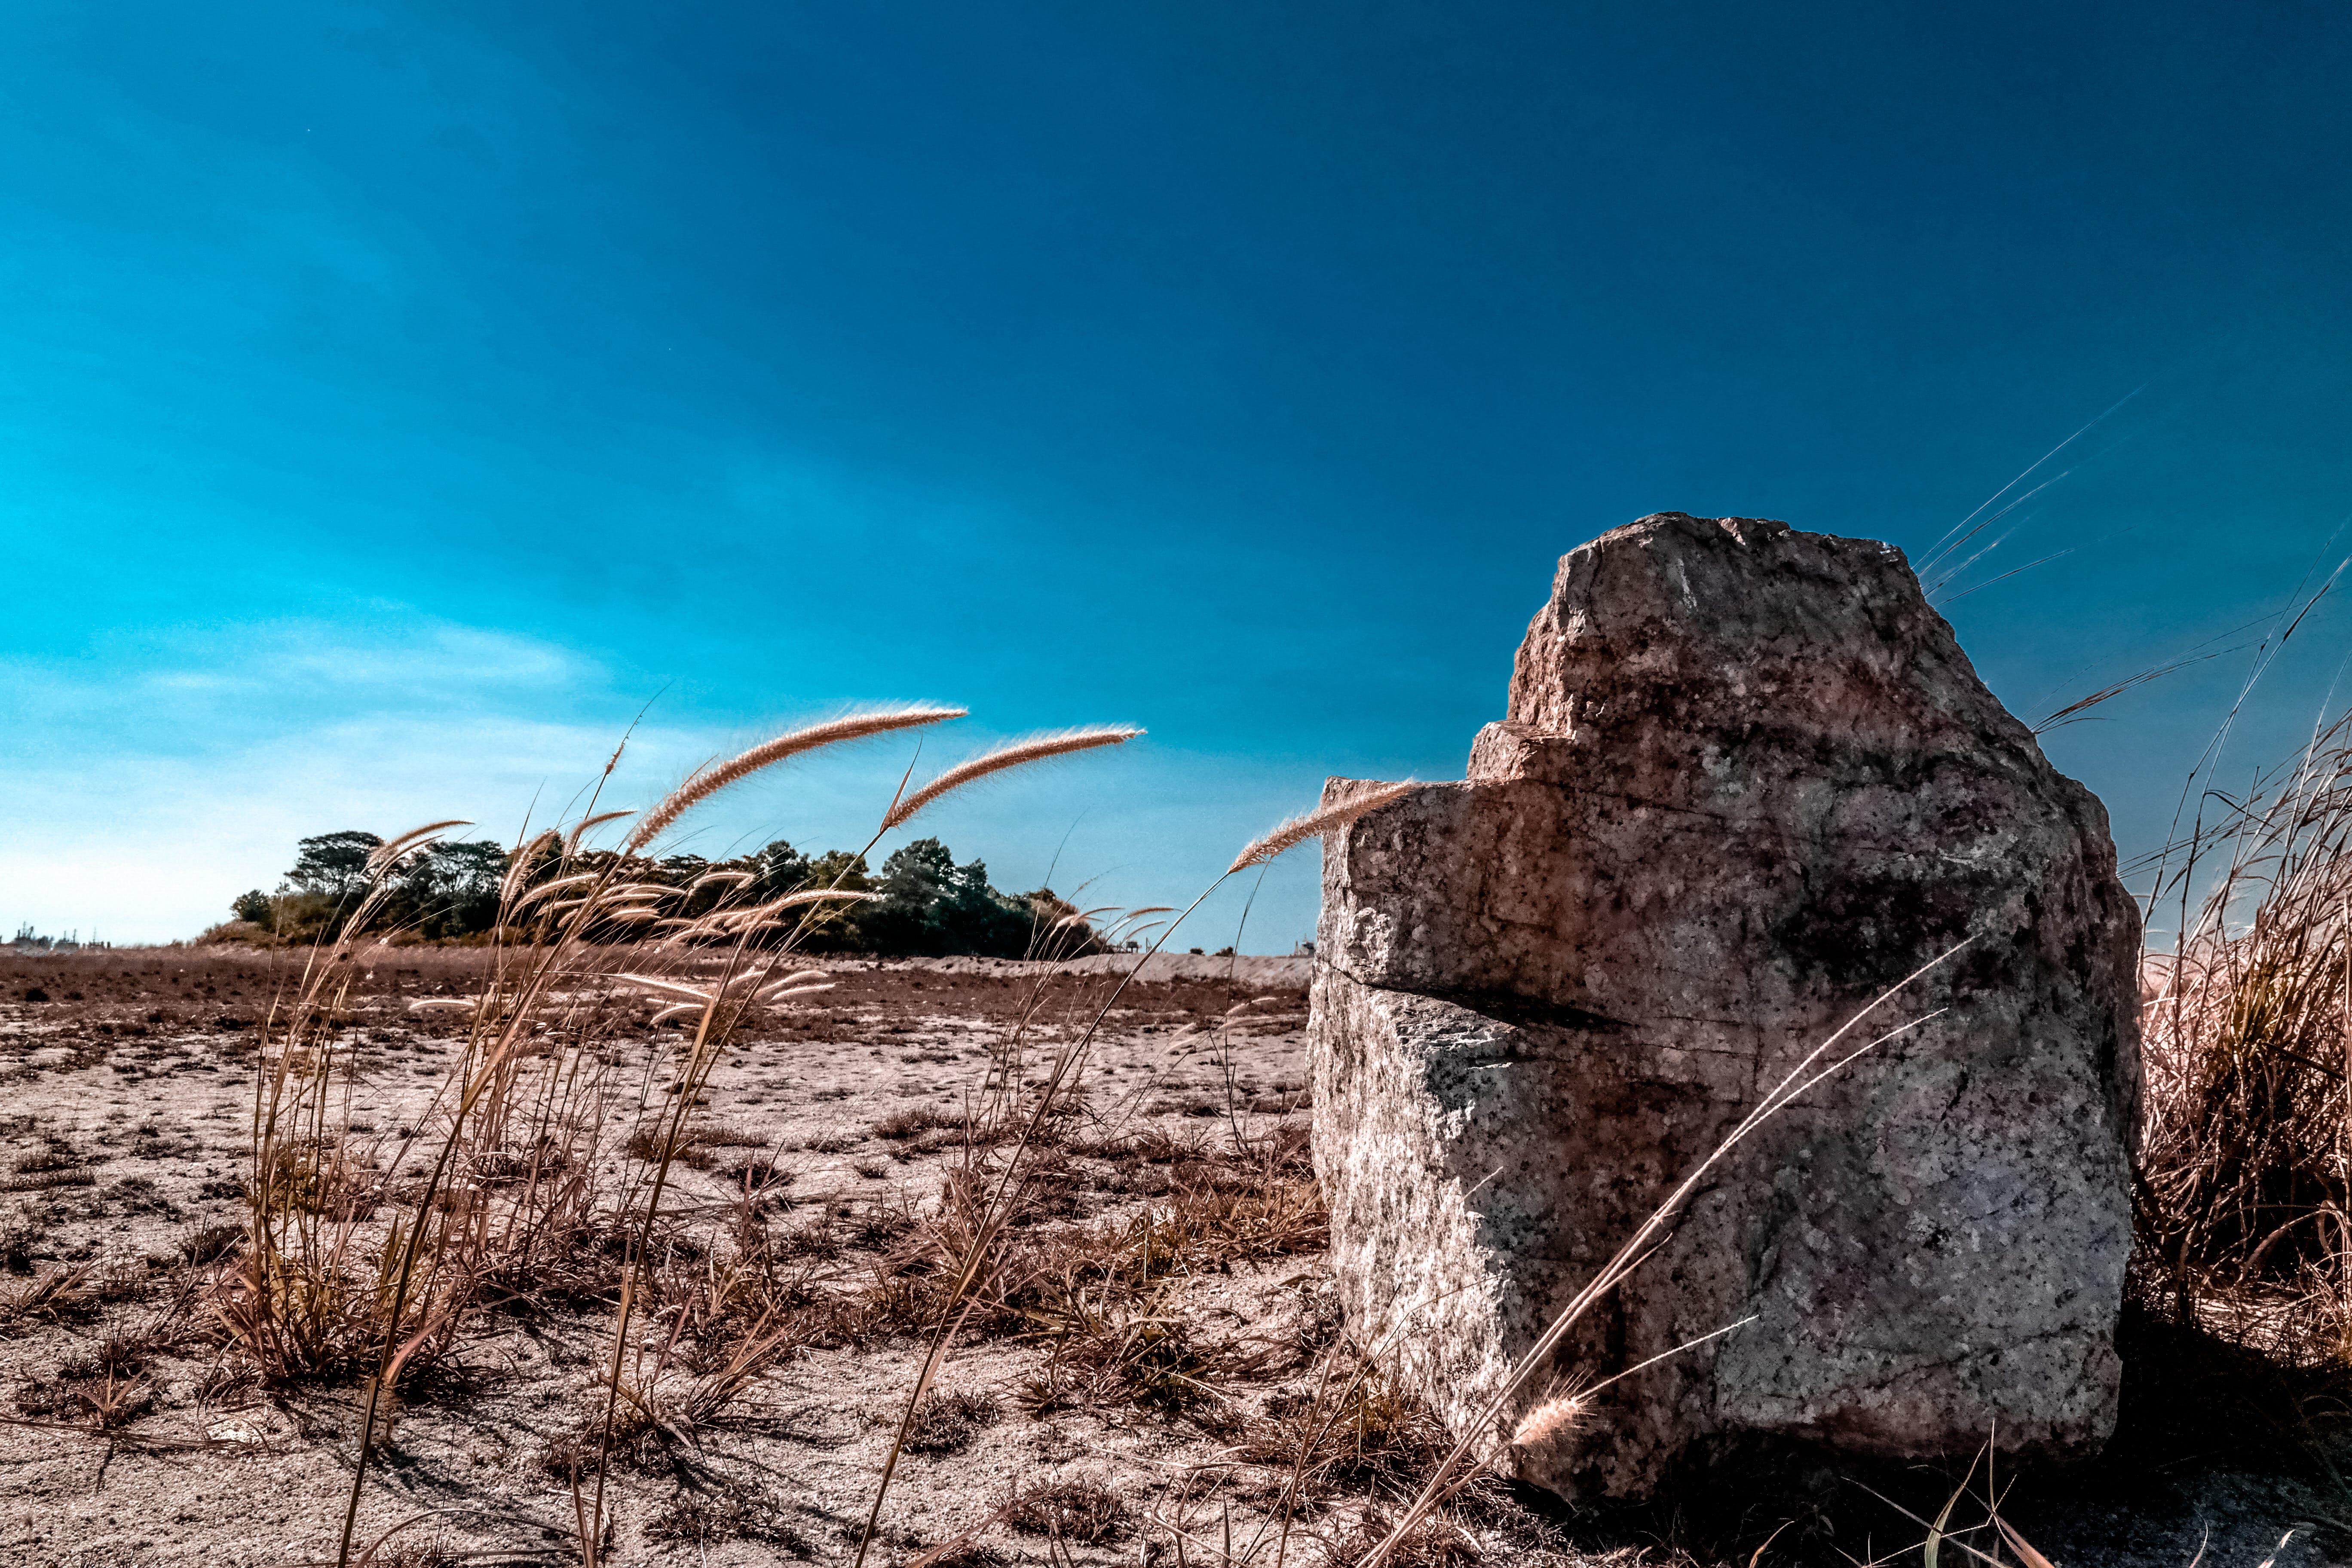 Brown Stone Under Blue Sky